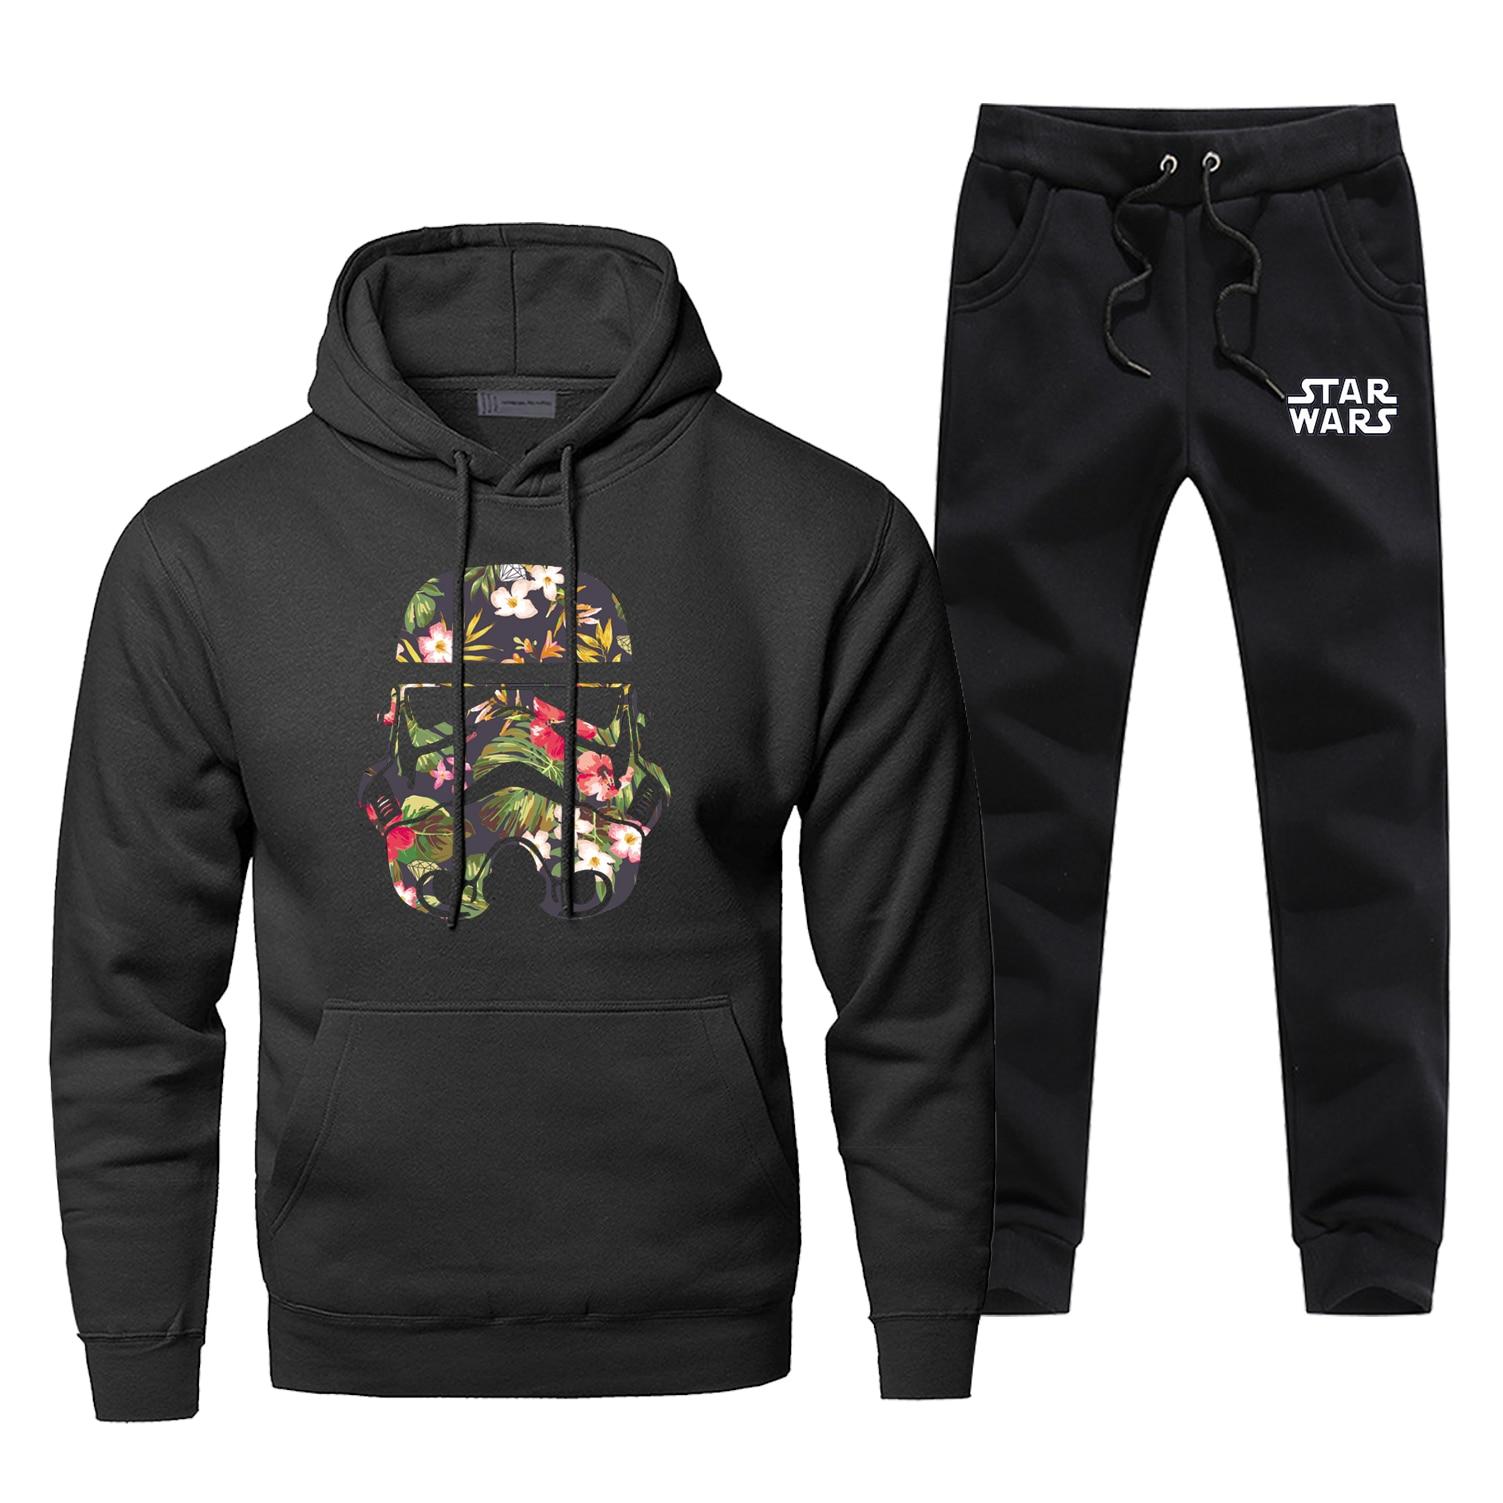 Star Wars Hoodies Pants Sets Men Suit Selfie Stormtrooper Starwars Tracksuit Pant Sweatshirt Sweatpants Sportswear Autumn Set